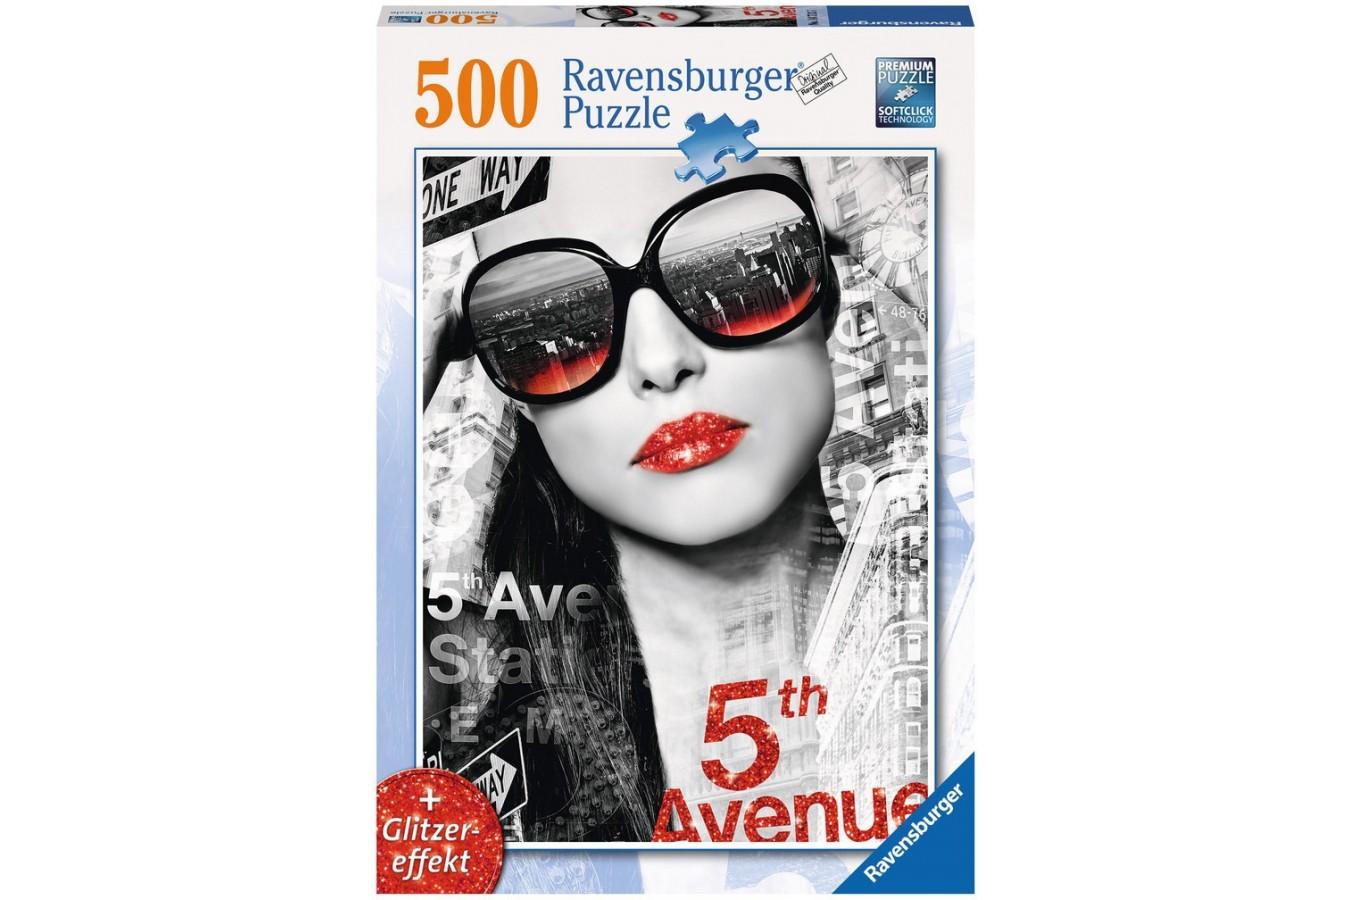 Puzzle Ravensburger - 5Th Avenue Fata, 500 piese (14713)